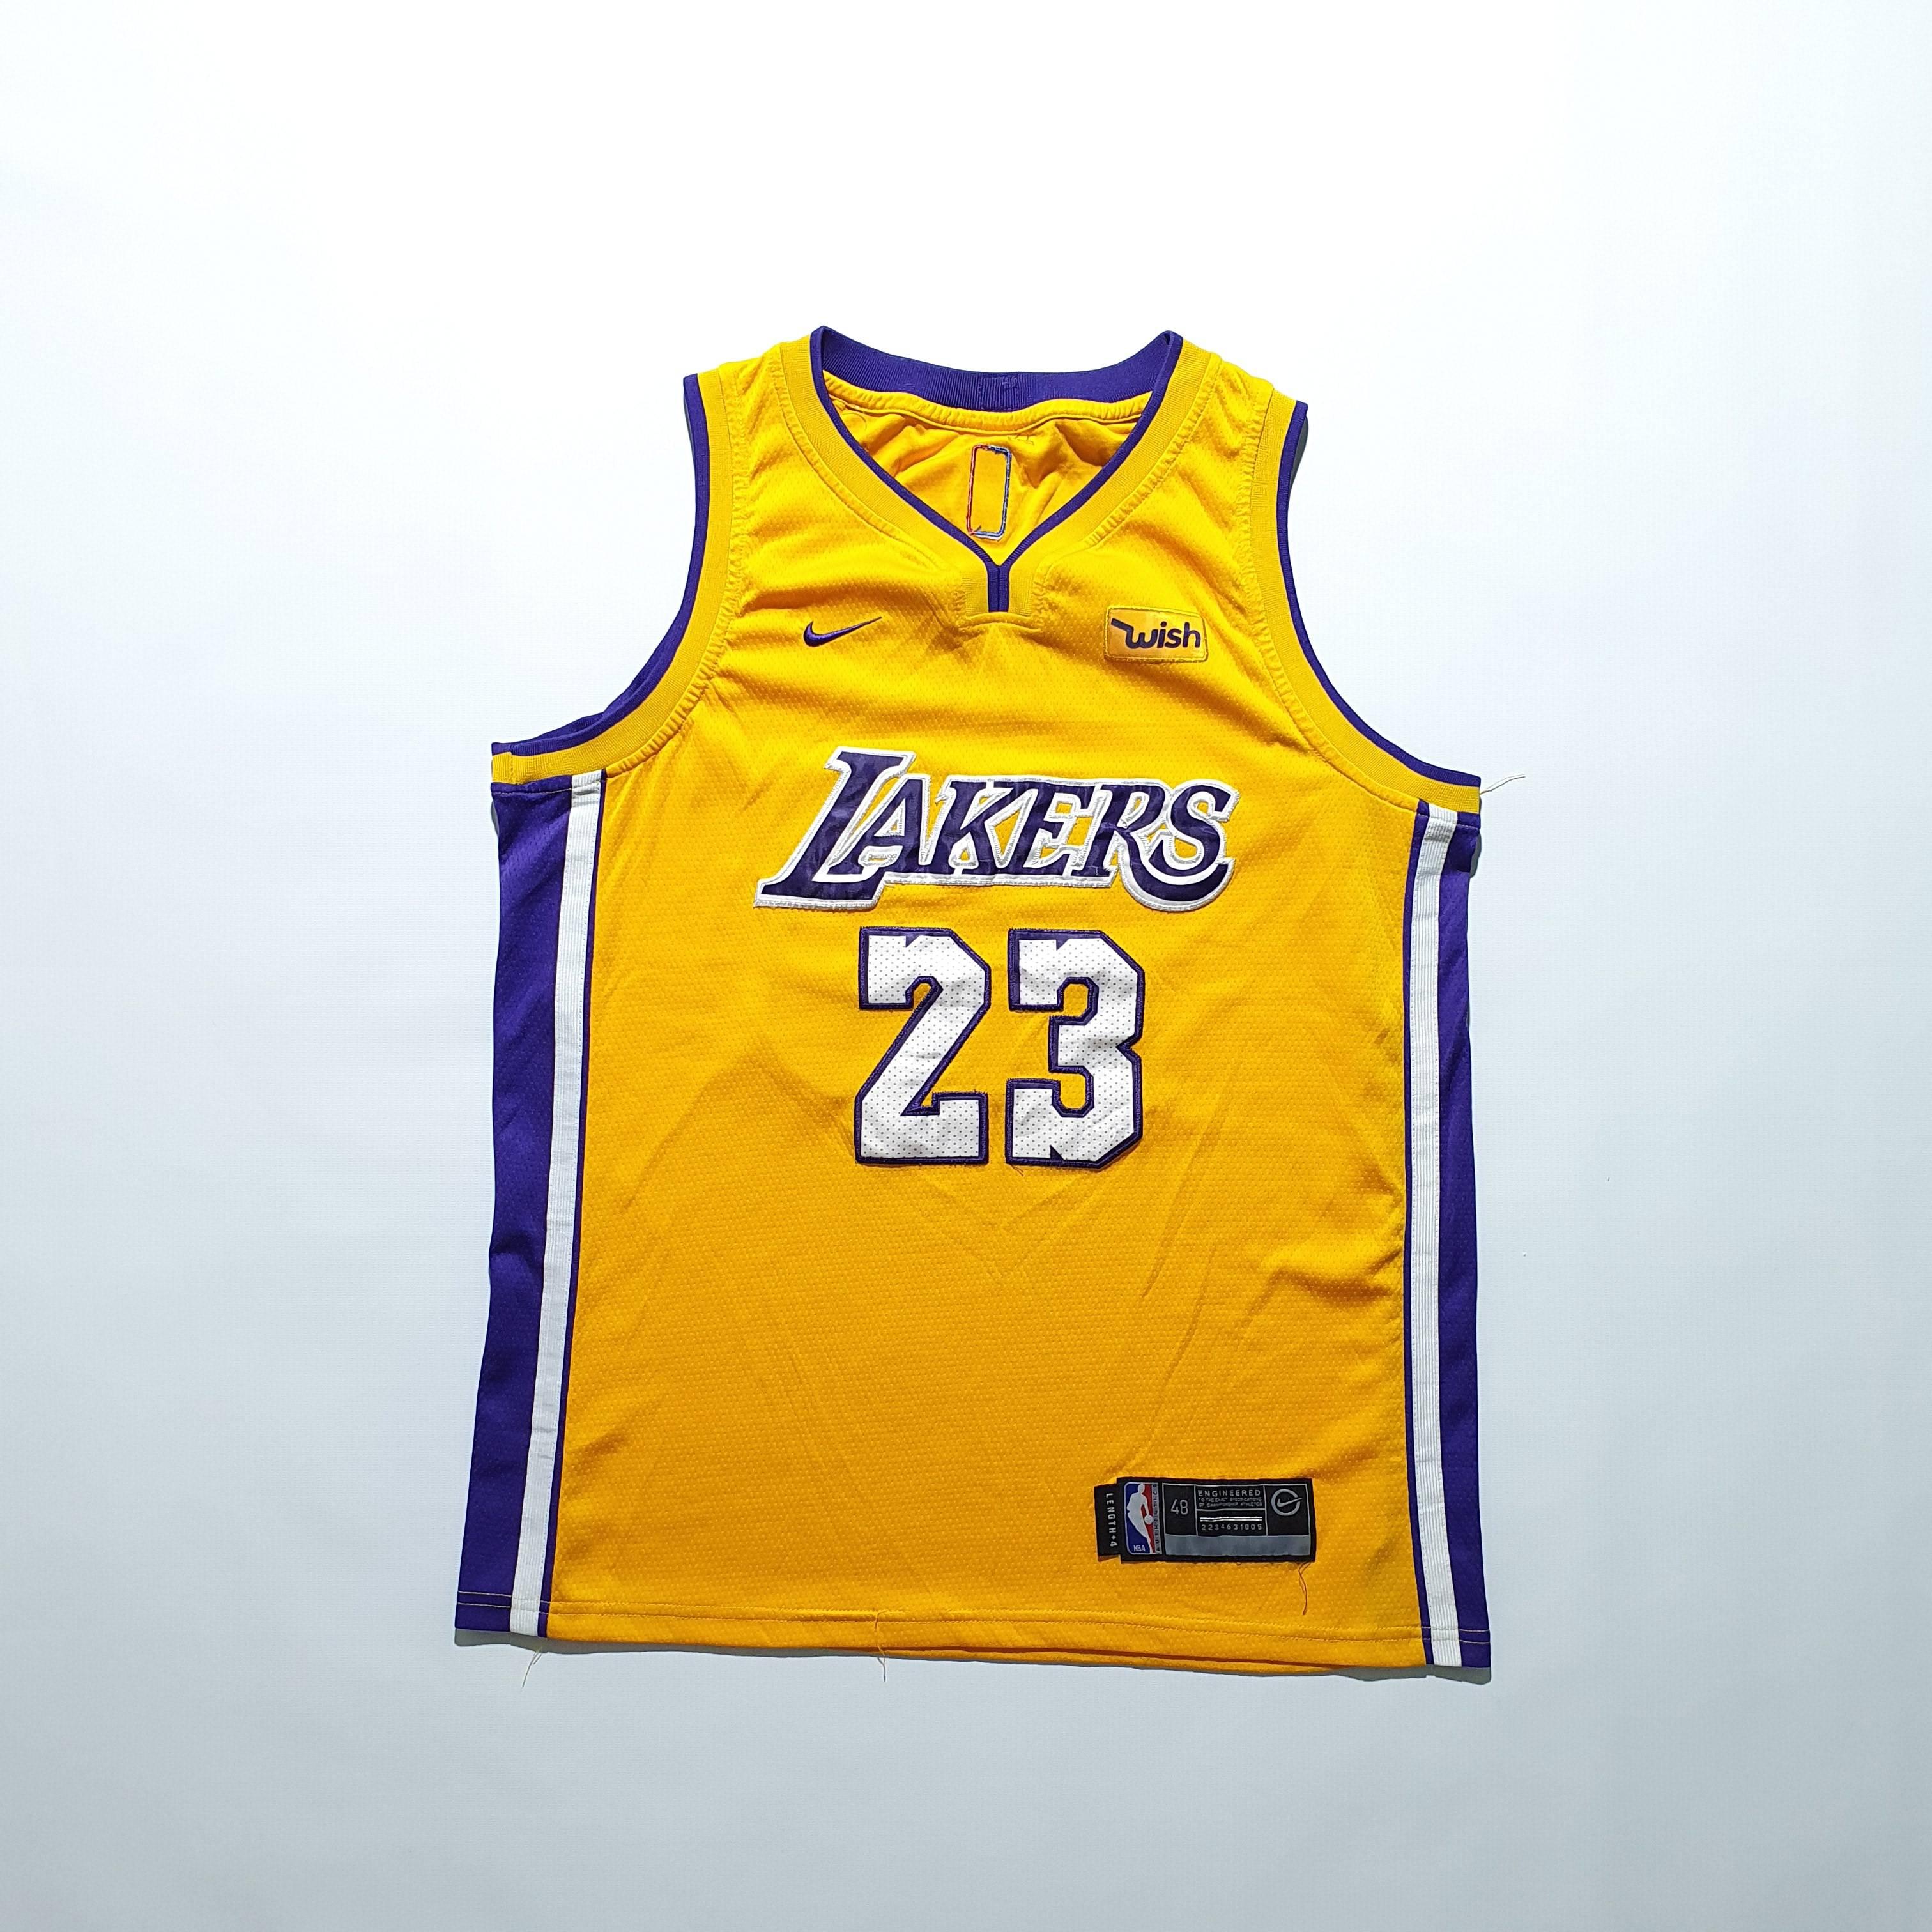 Nike Nike Lakers Lebron James 23 Jersey Tshirt